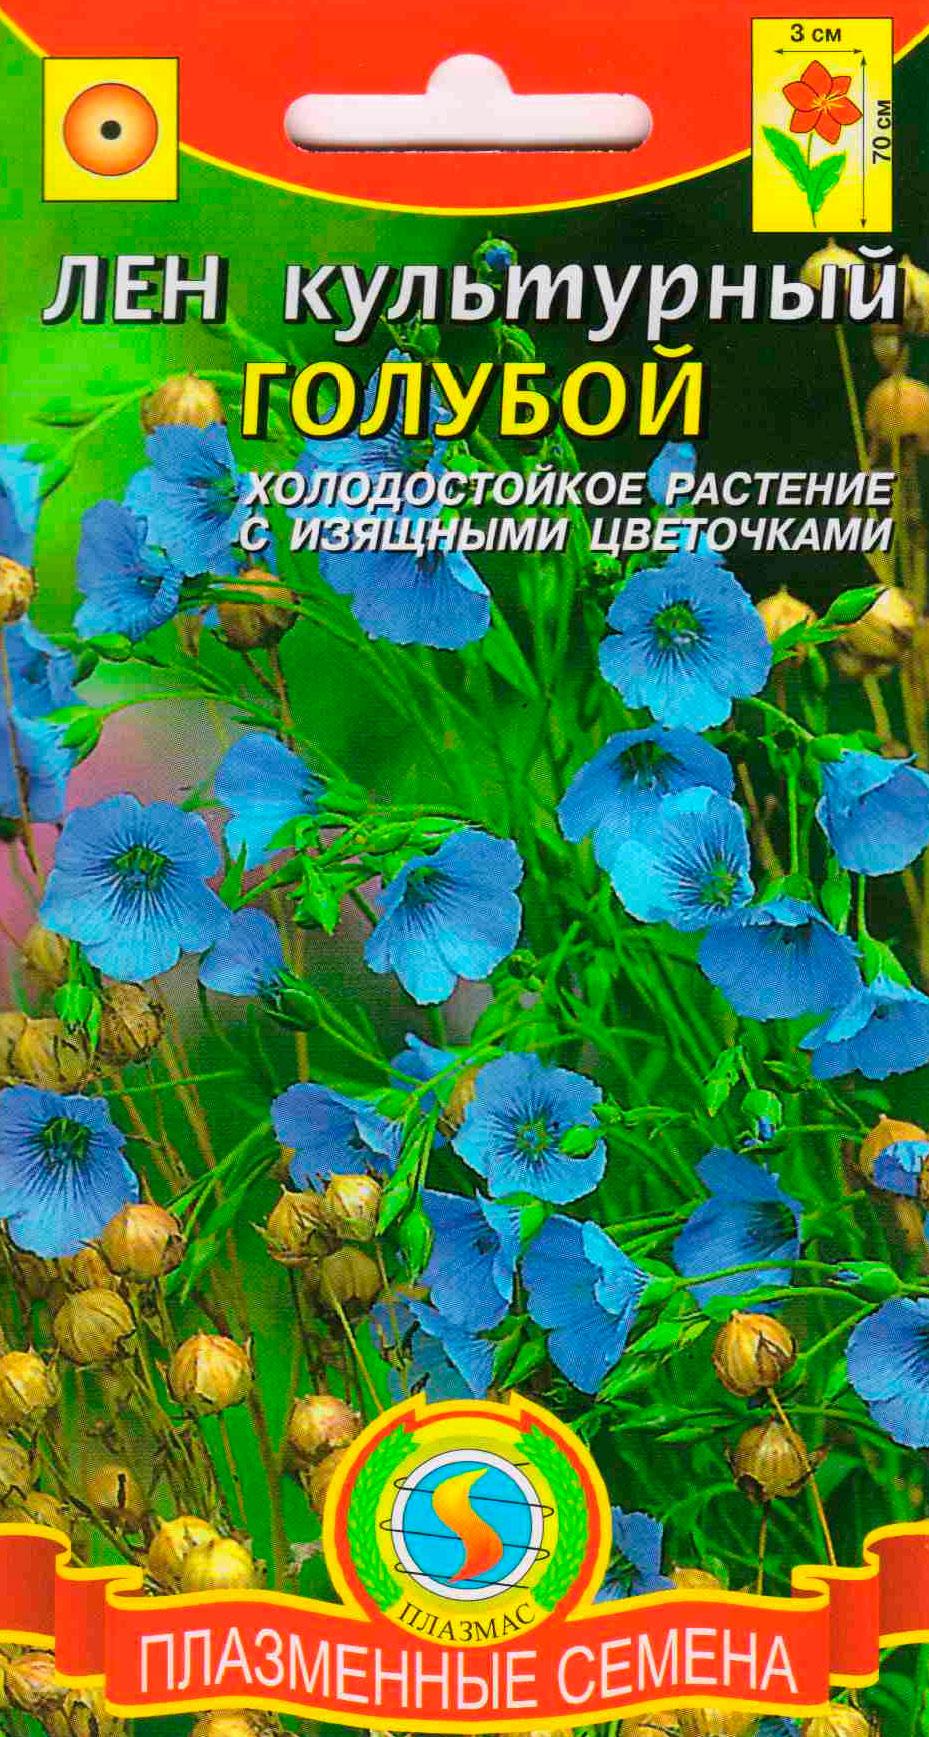 Цветы лен однолетний